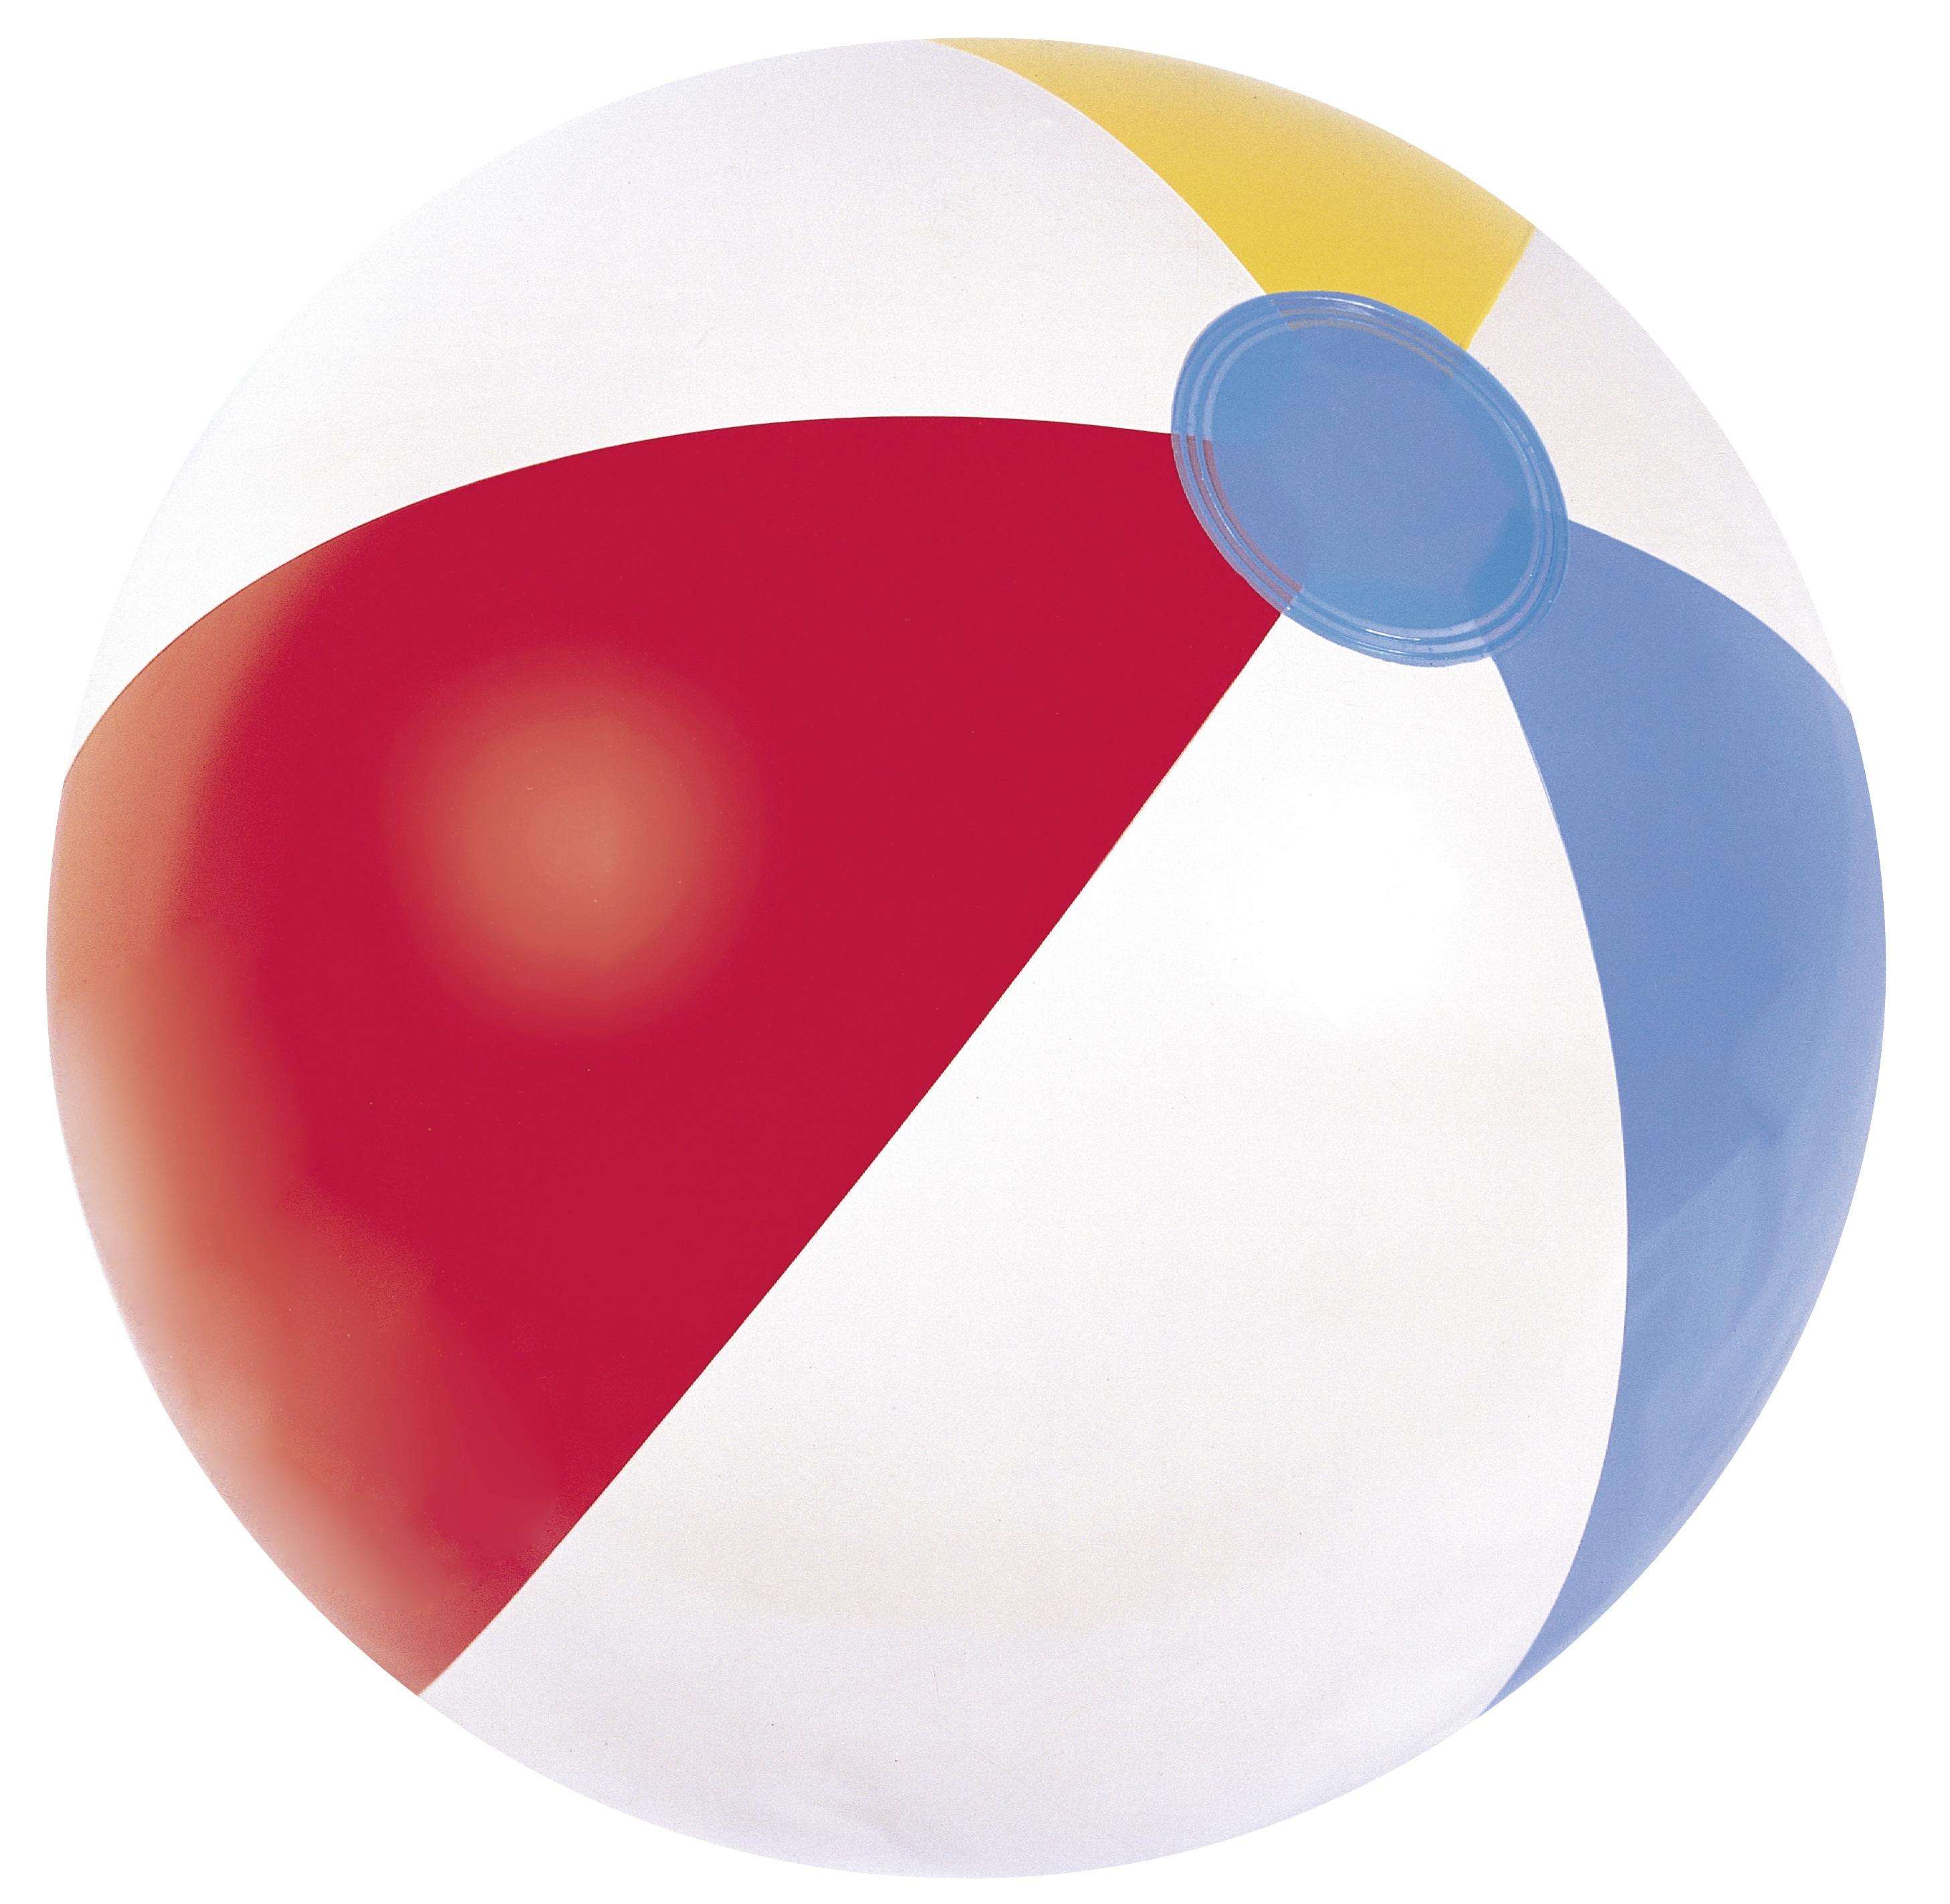 Ball Beach Inflatable 51 Cm, Bestway